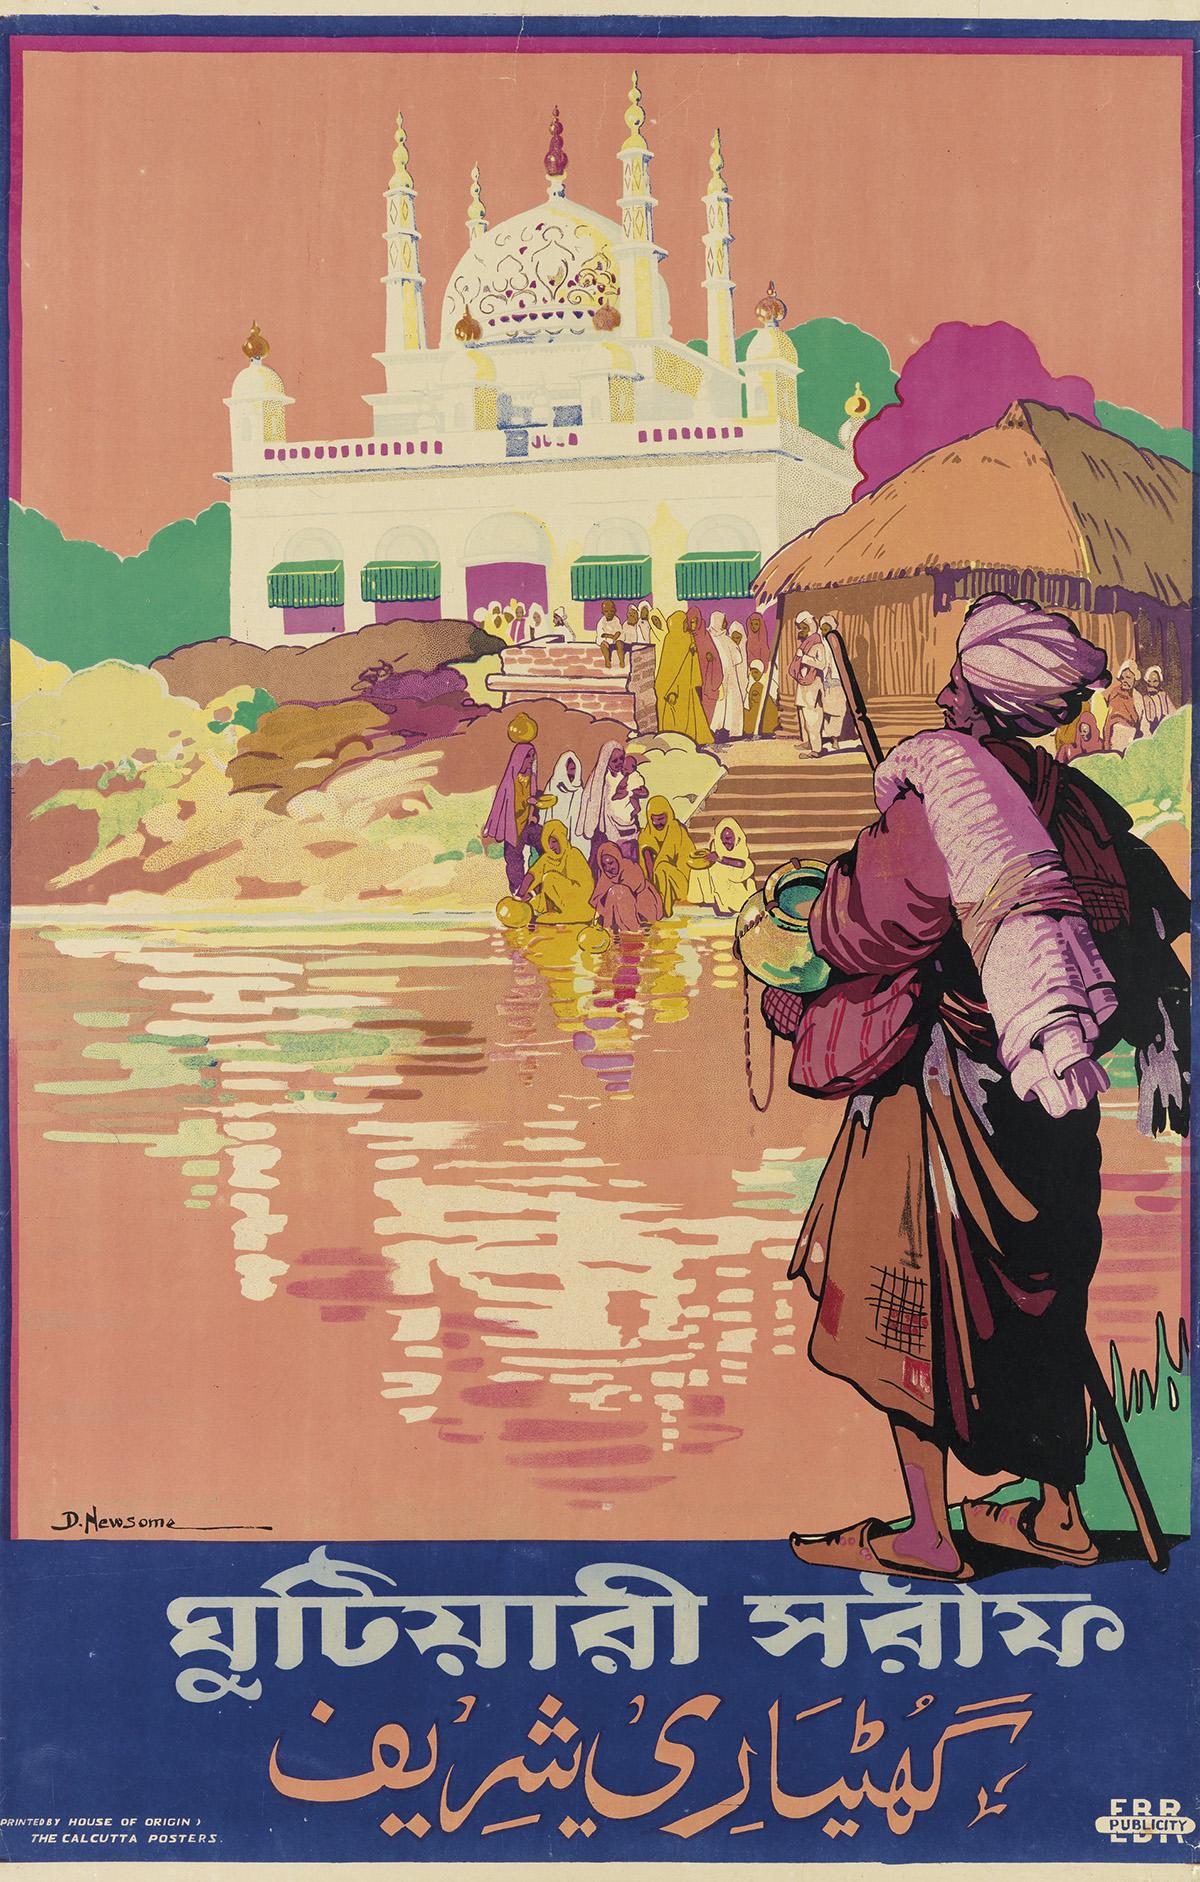 DOROTHY-NEWSOME-(CIRCA-1900-1980)-[GHUTIARI-SHARIF]-Circa-19